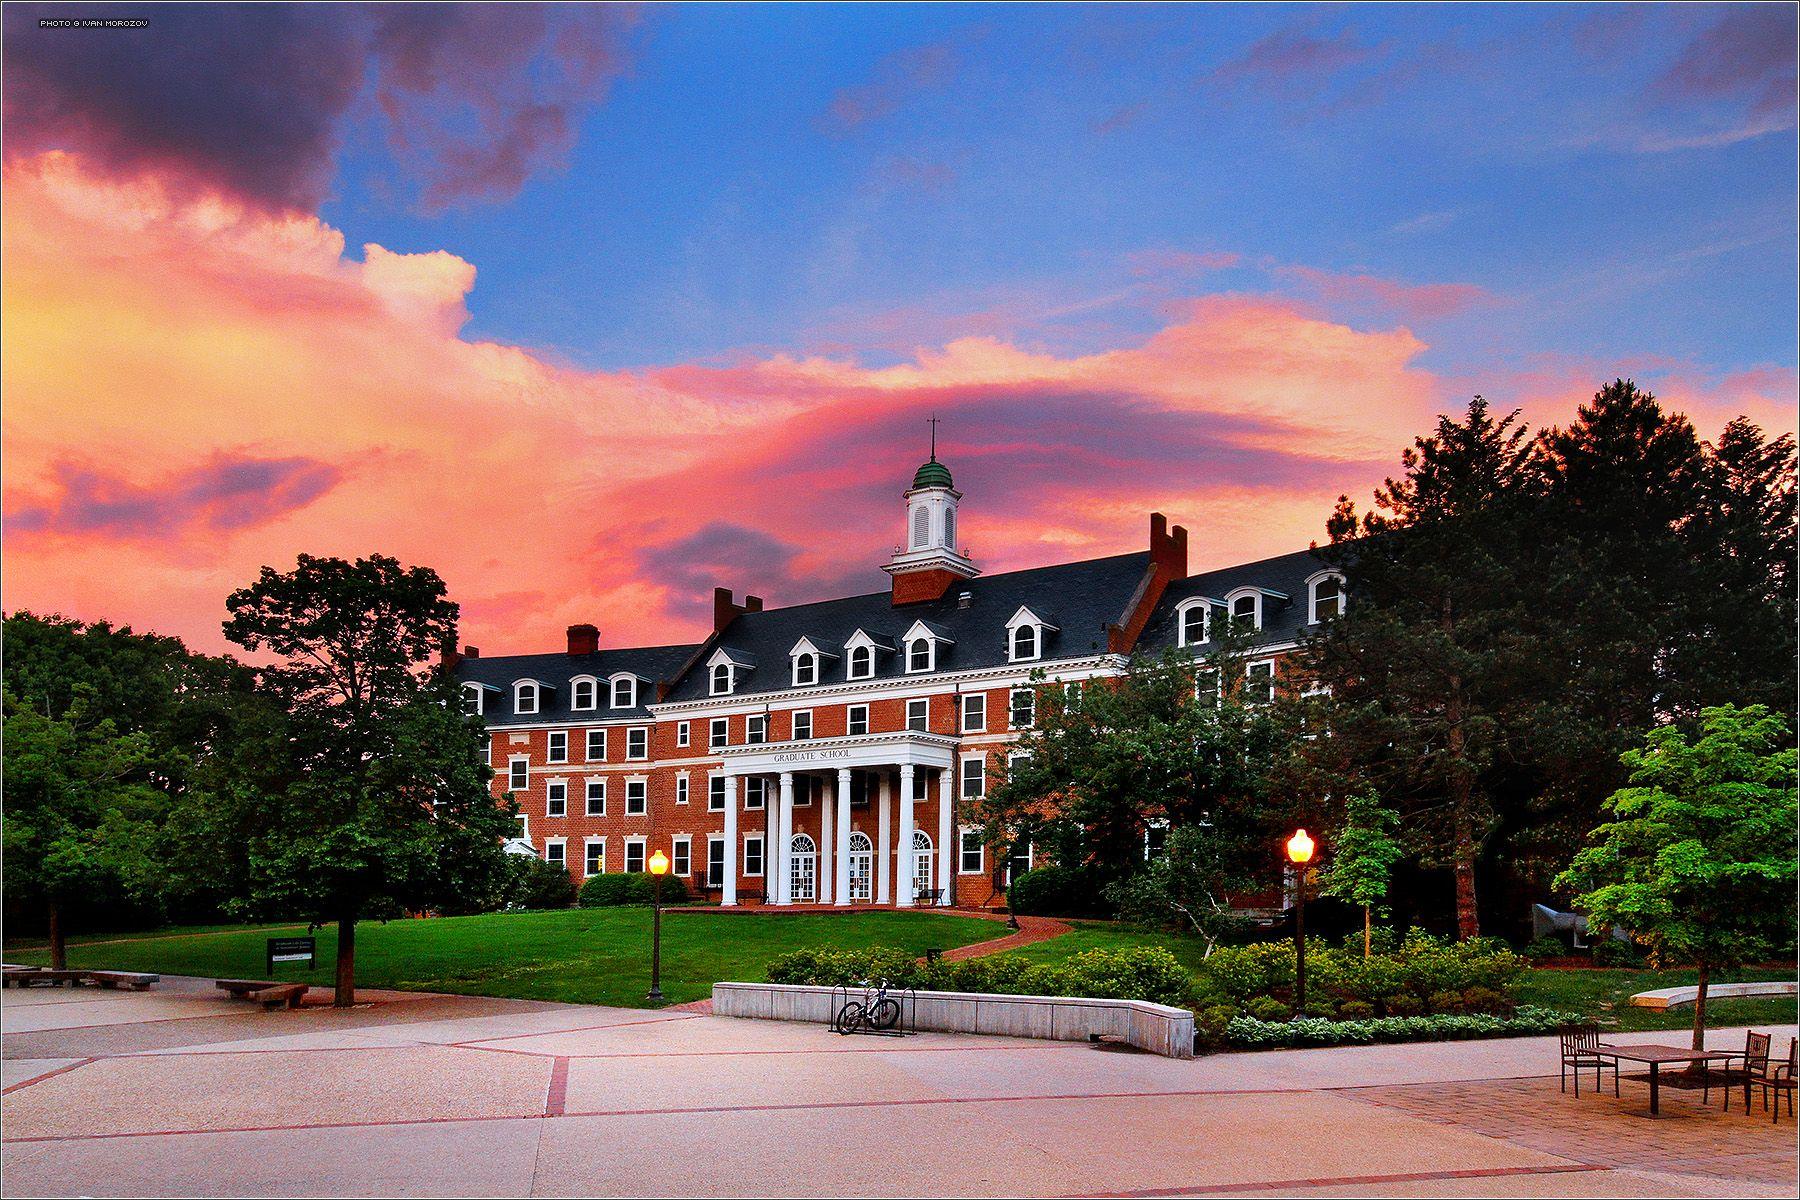 Graduate Life Center at Donaldson Brown. Virginia Tech